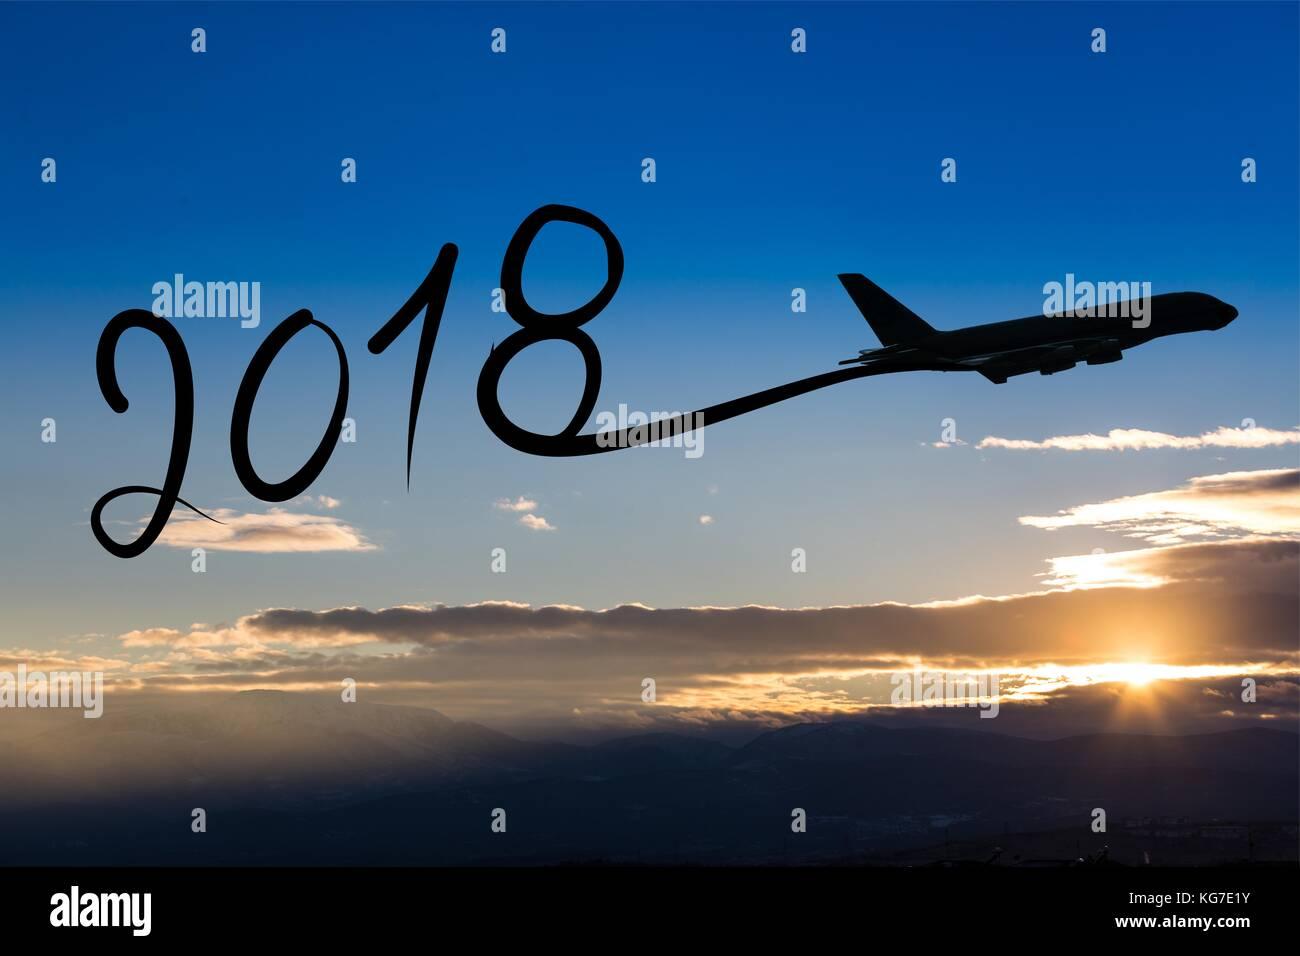 Plane And Calendar Stock Photos Amp Plane And Calendar Stock